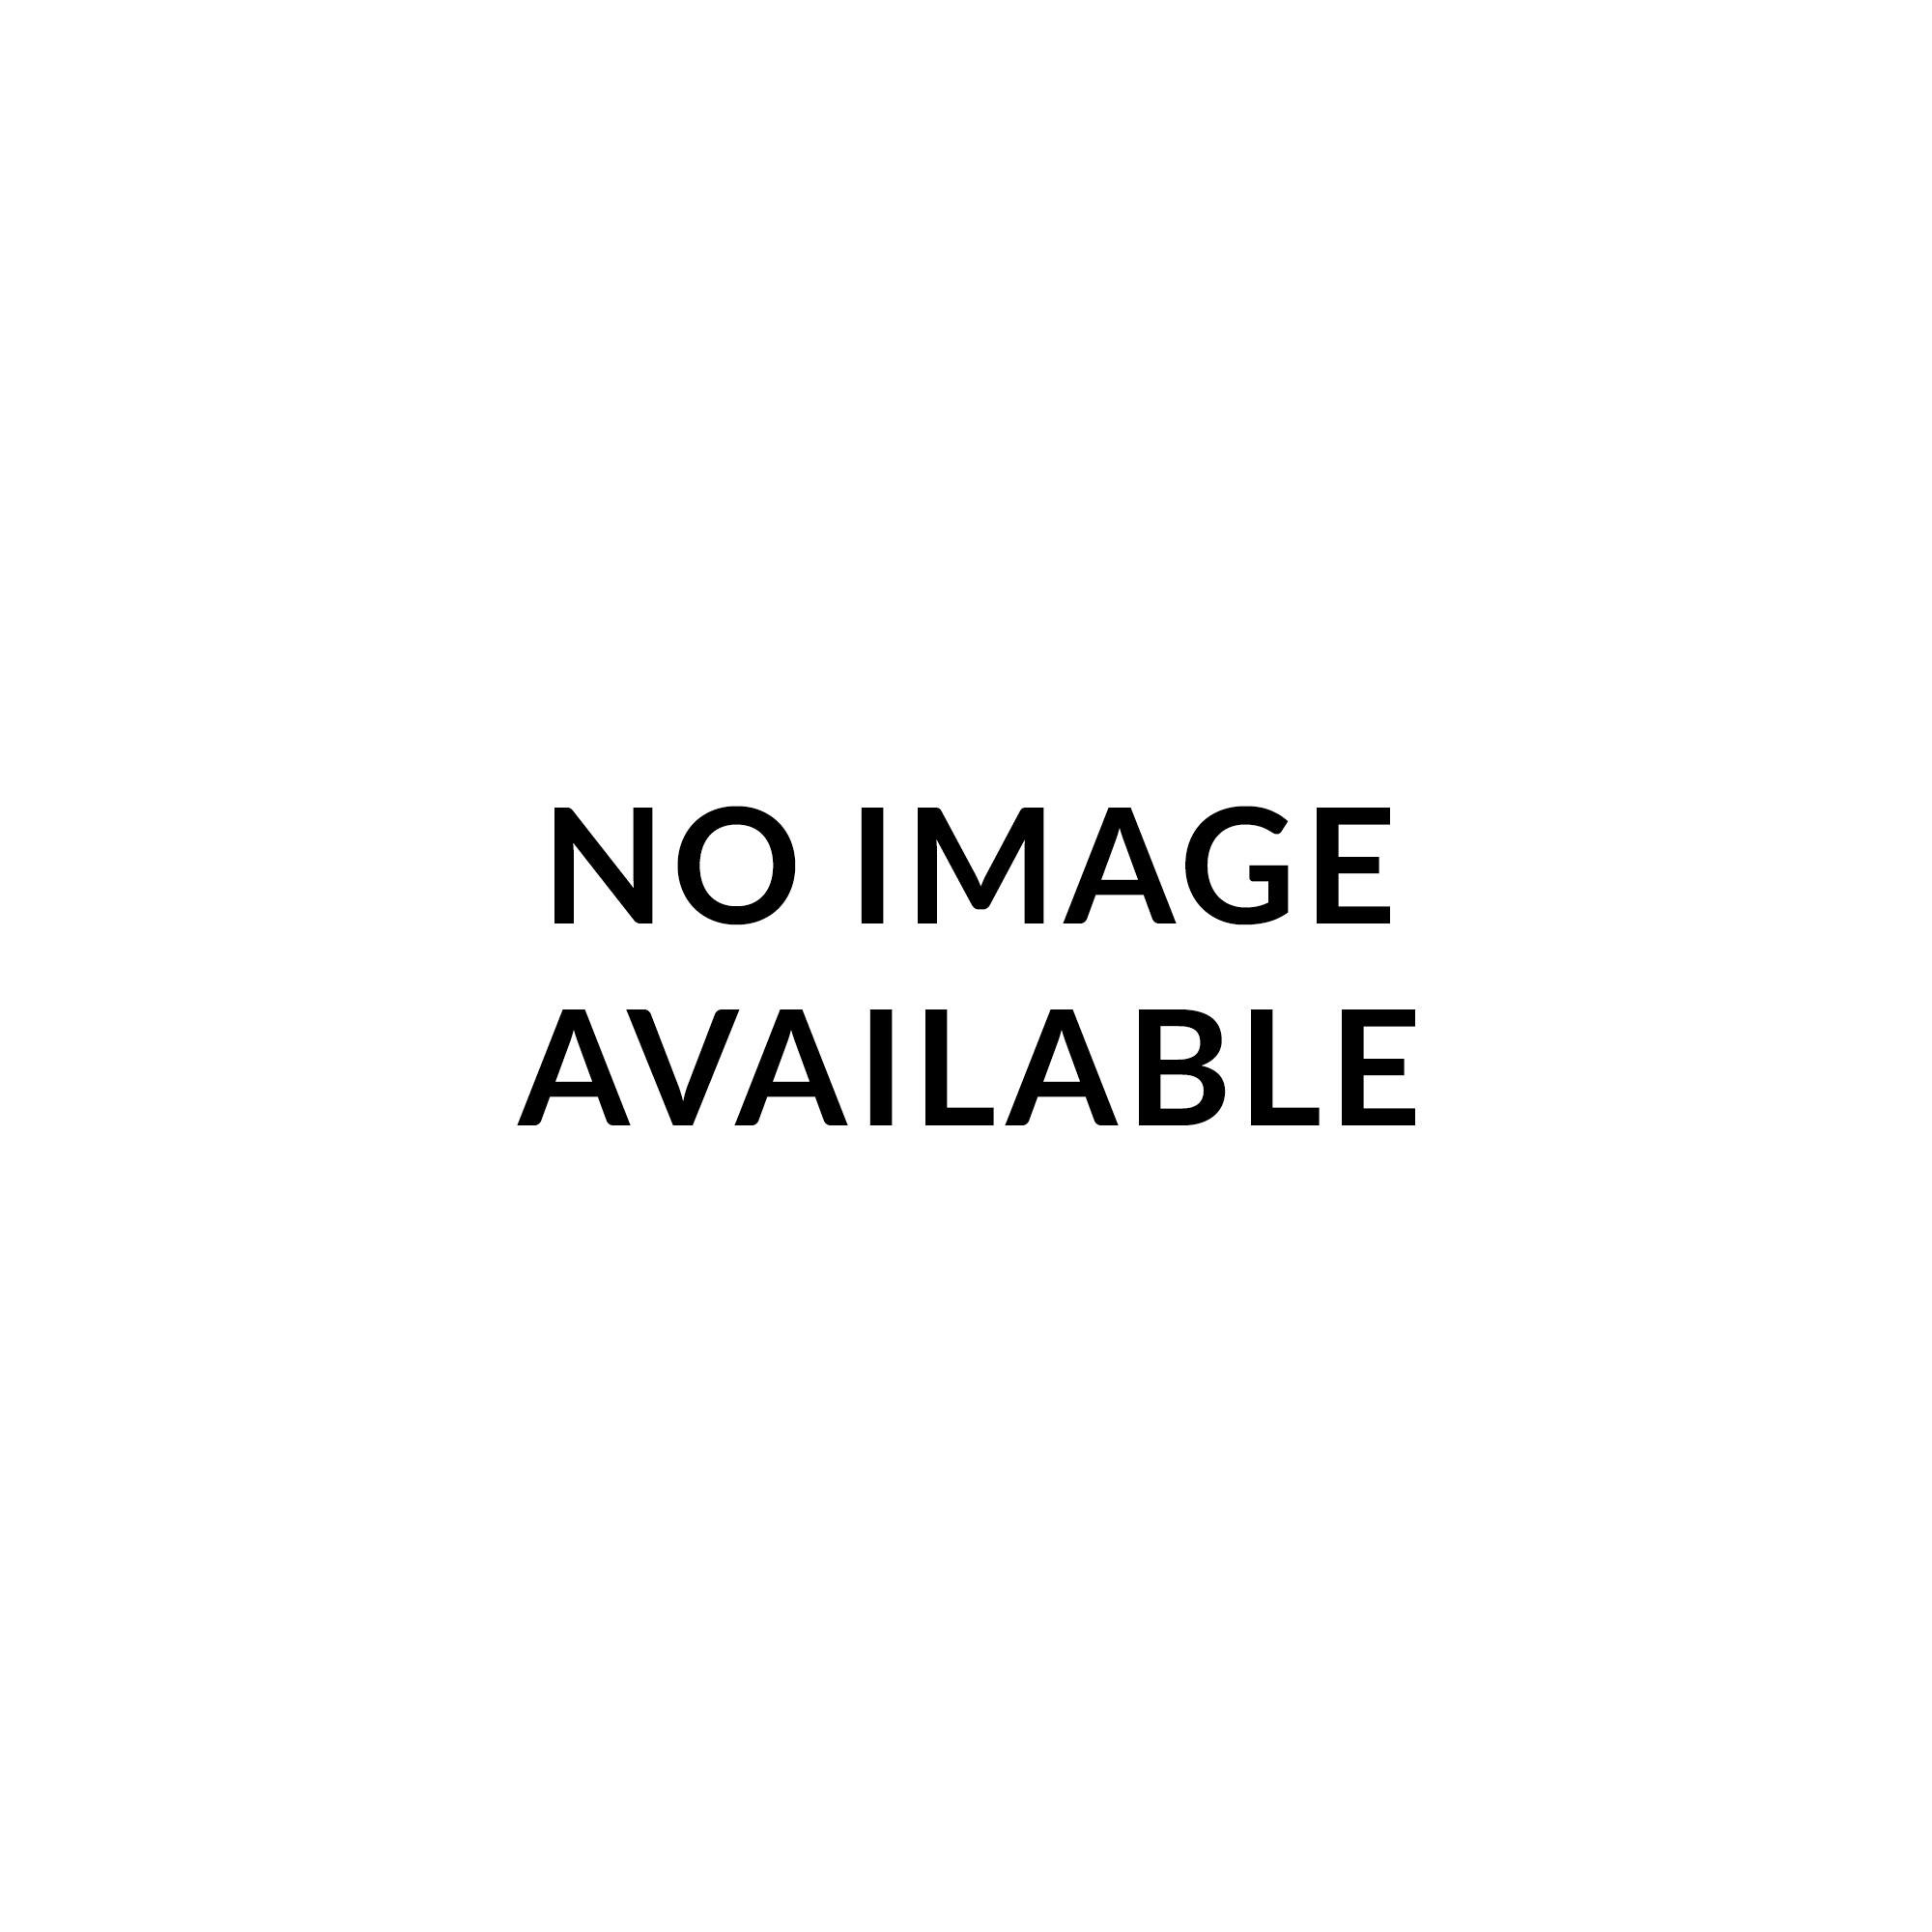 D'Addario PSB085 ProSteels XL Bass Single String .085 Long Scale